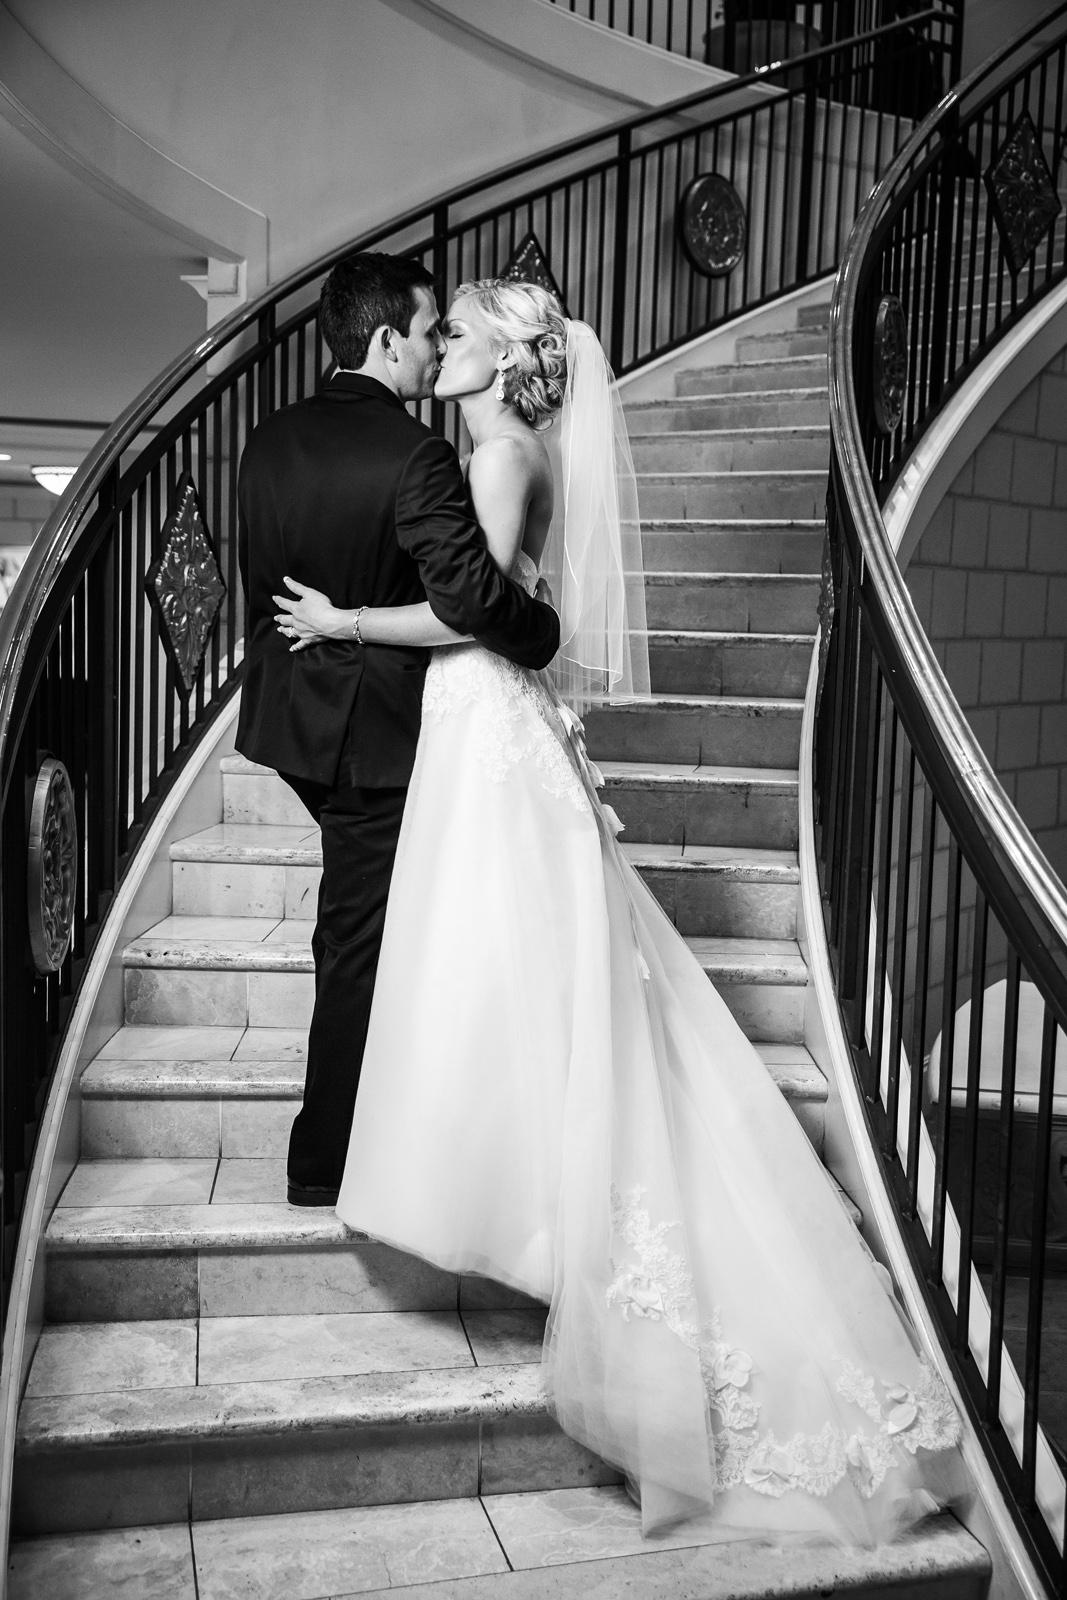 St Louis Washington University Wedding Photos_20141115_19252251.jpg